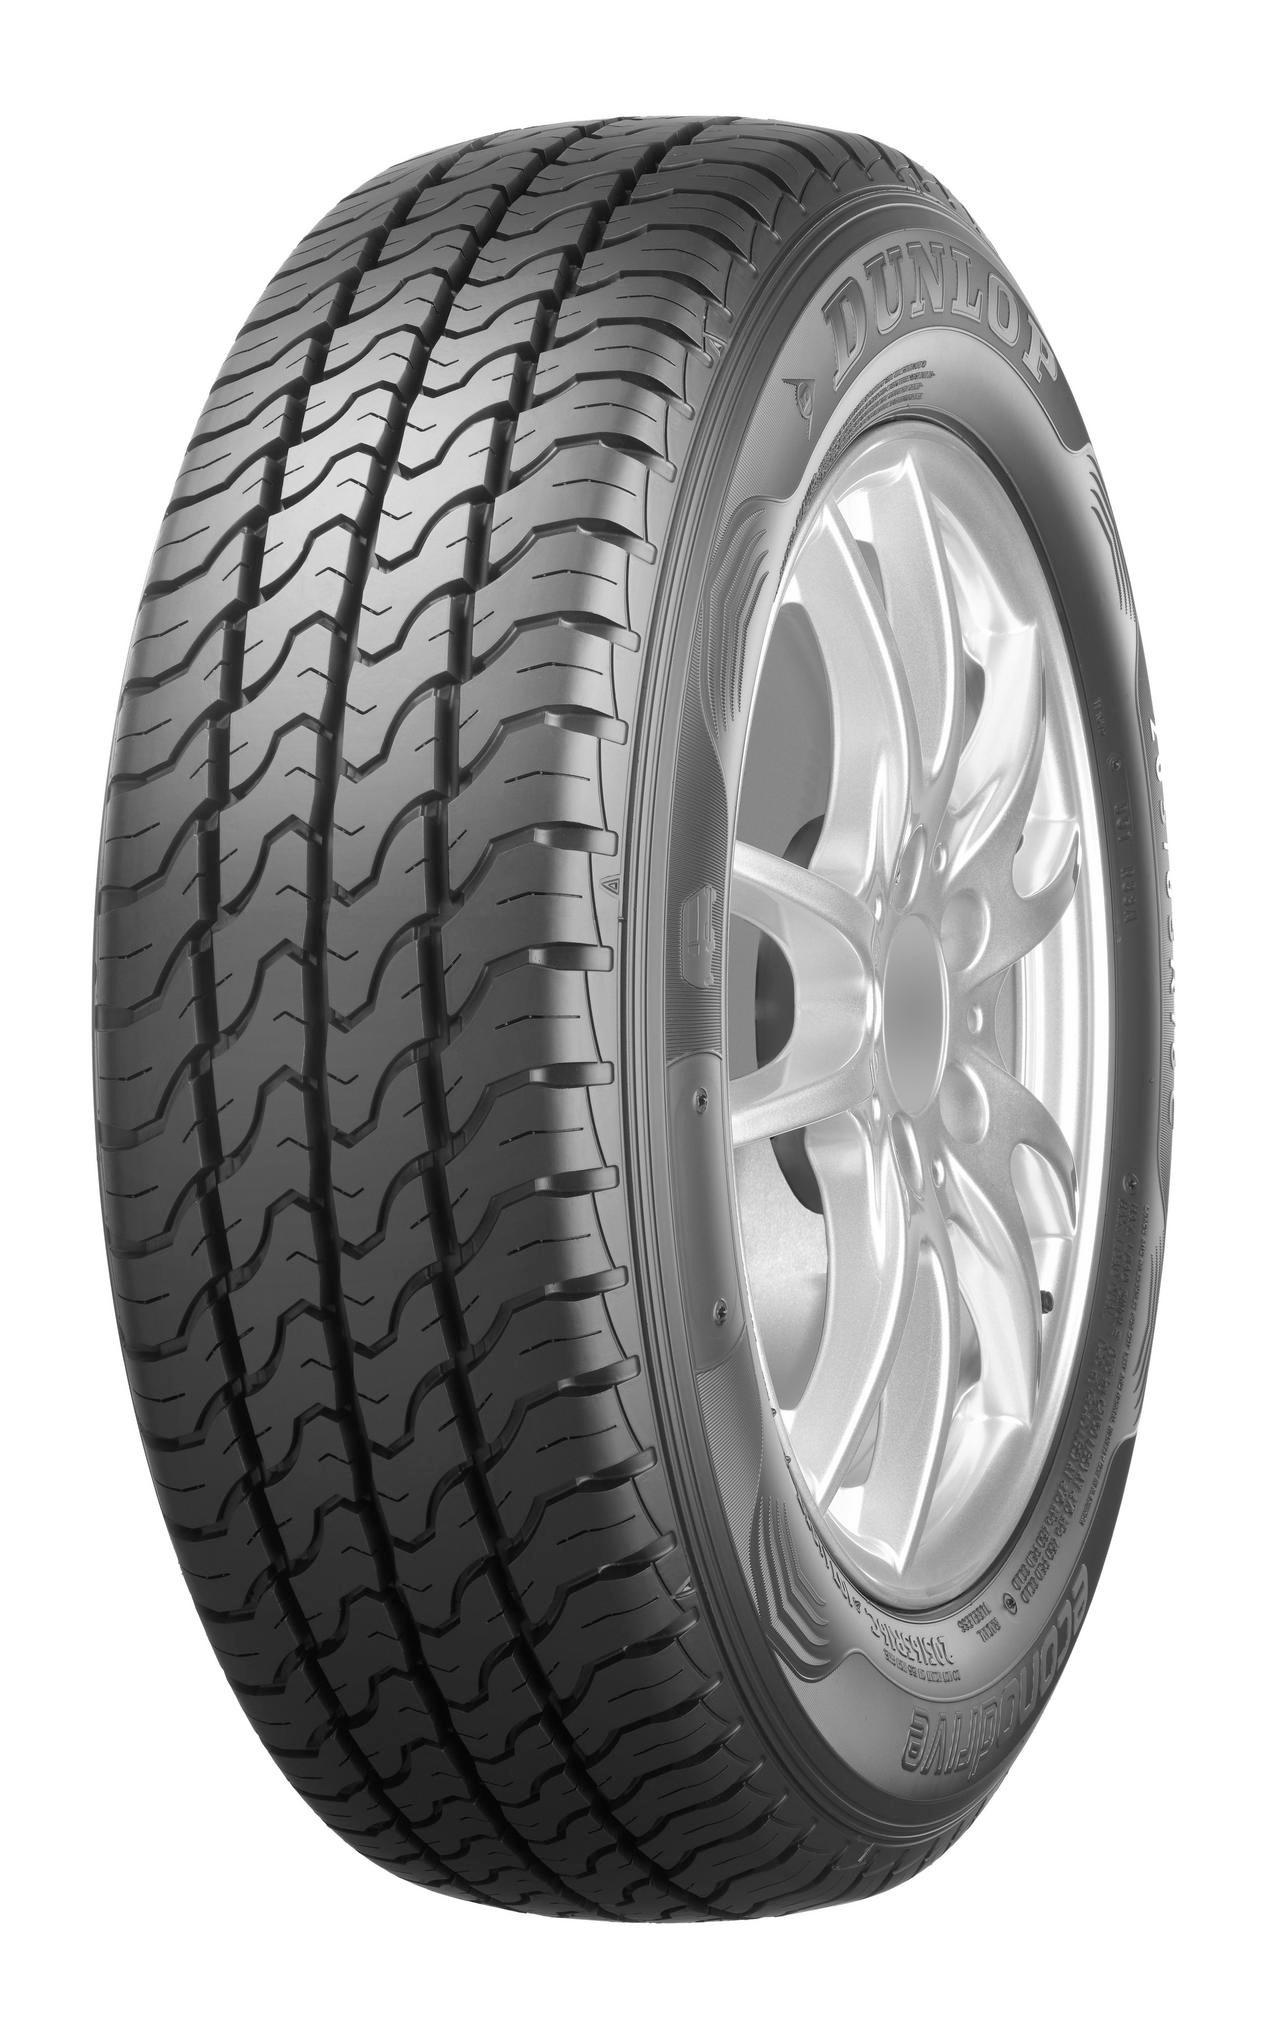 Dunlop Econodrive 185/75R16C 104/102R